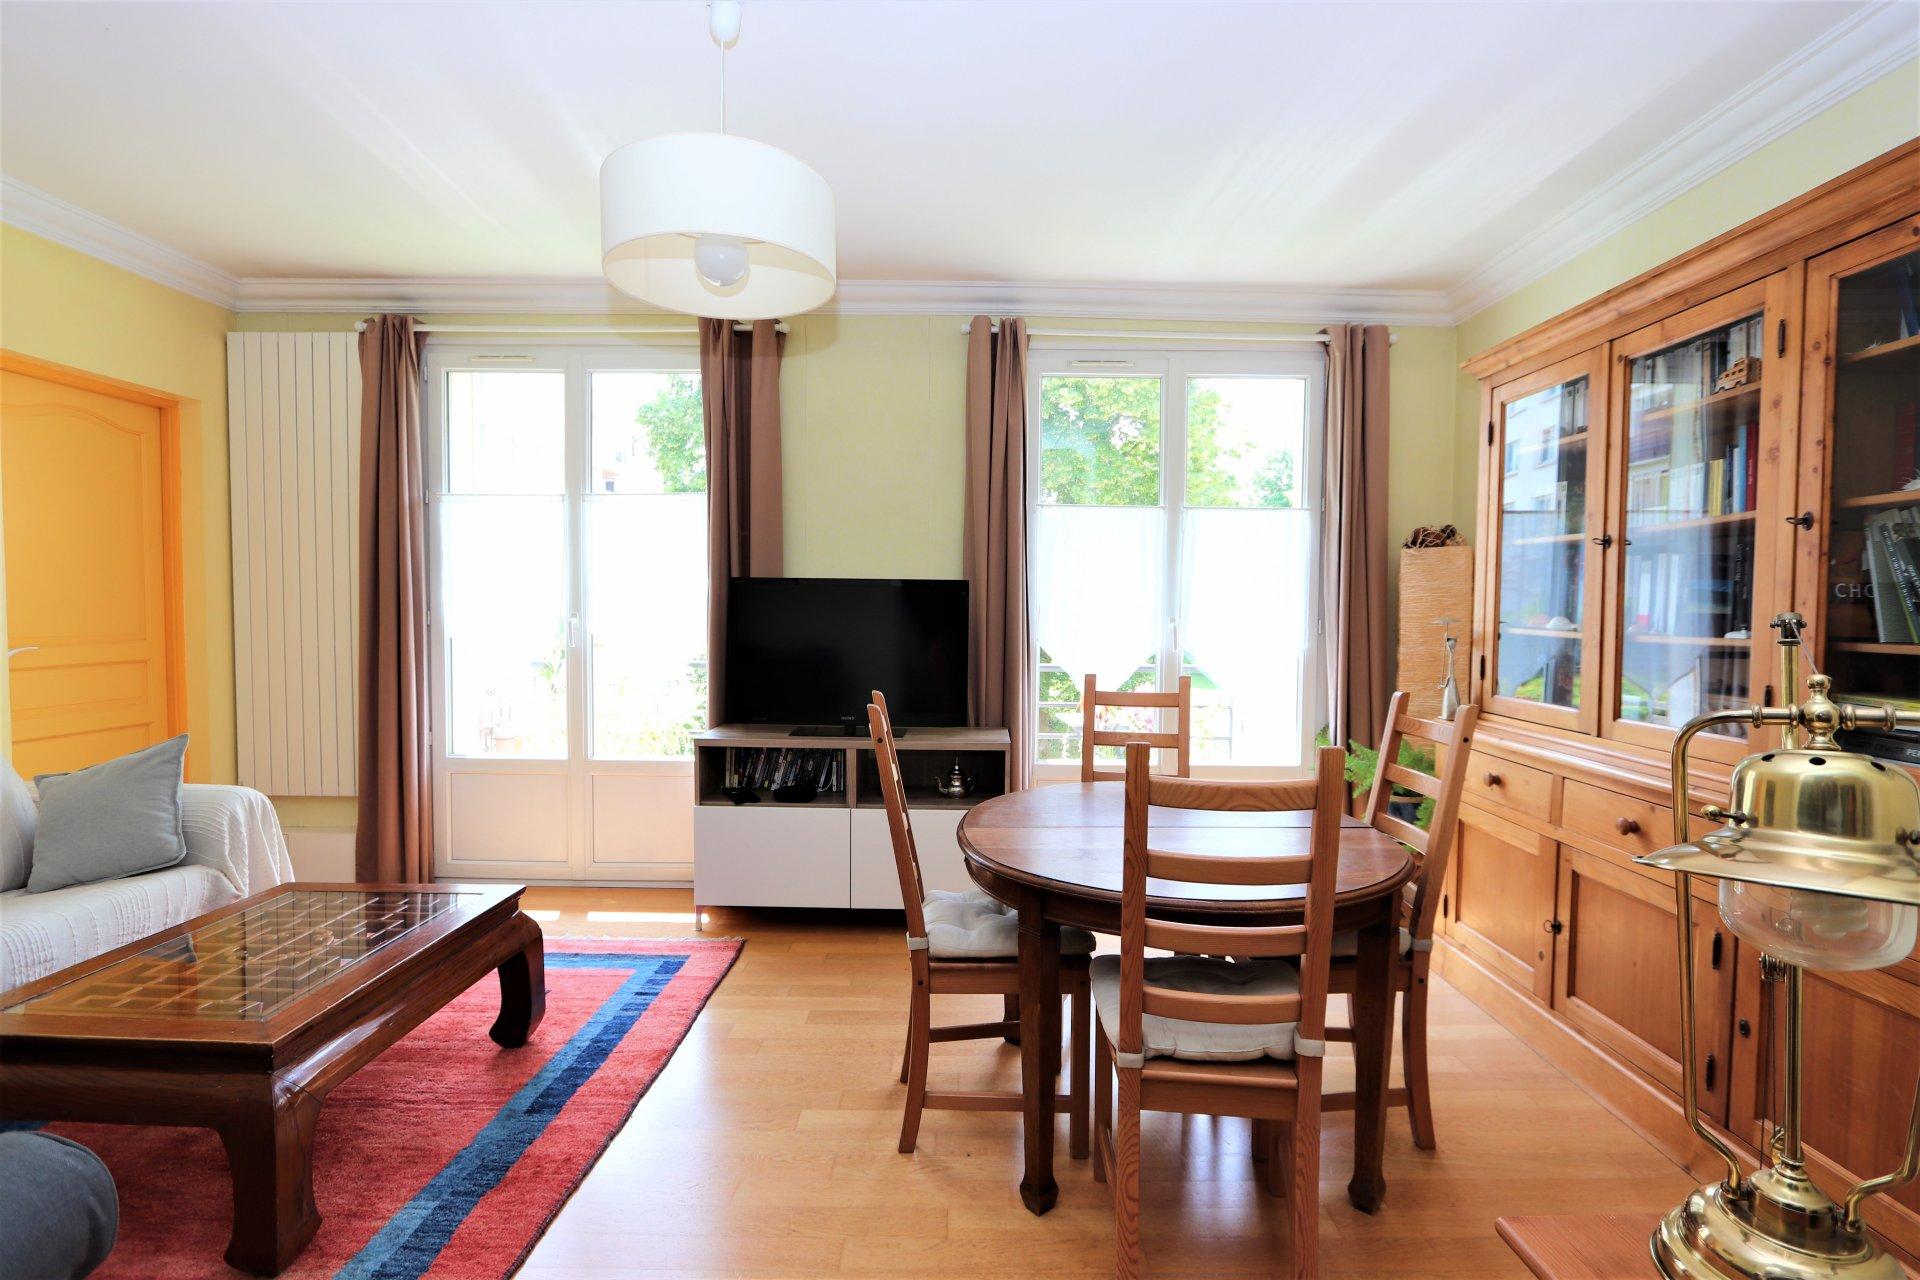 Venda Apartamento - Brunoy